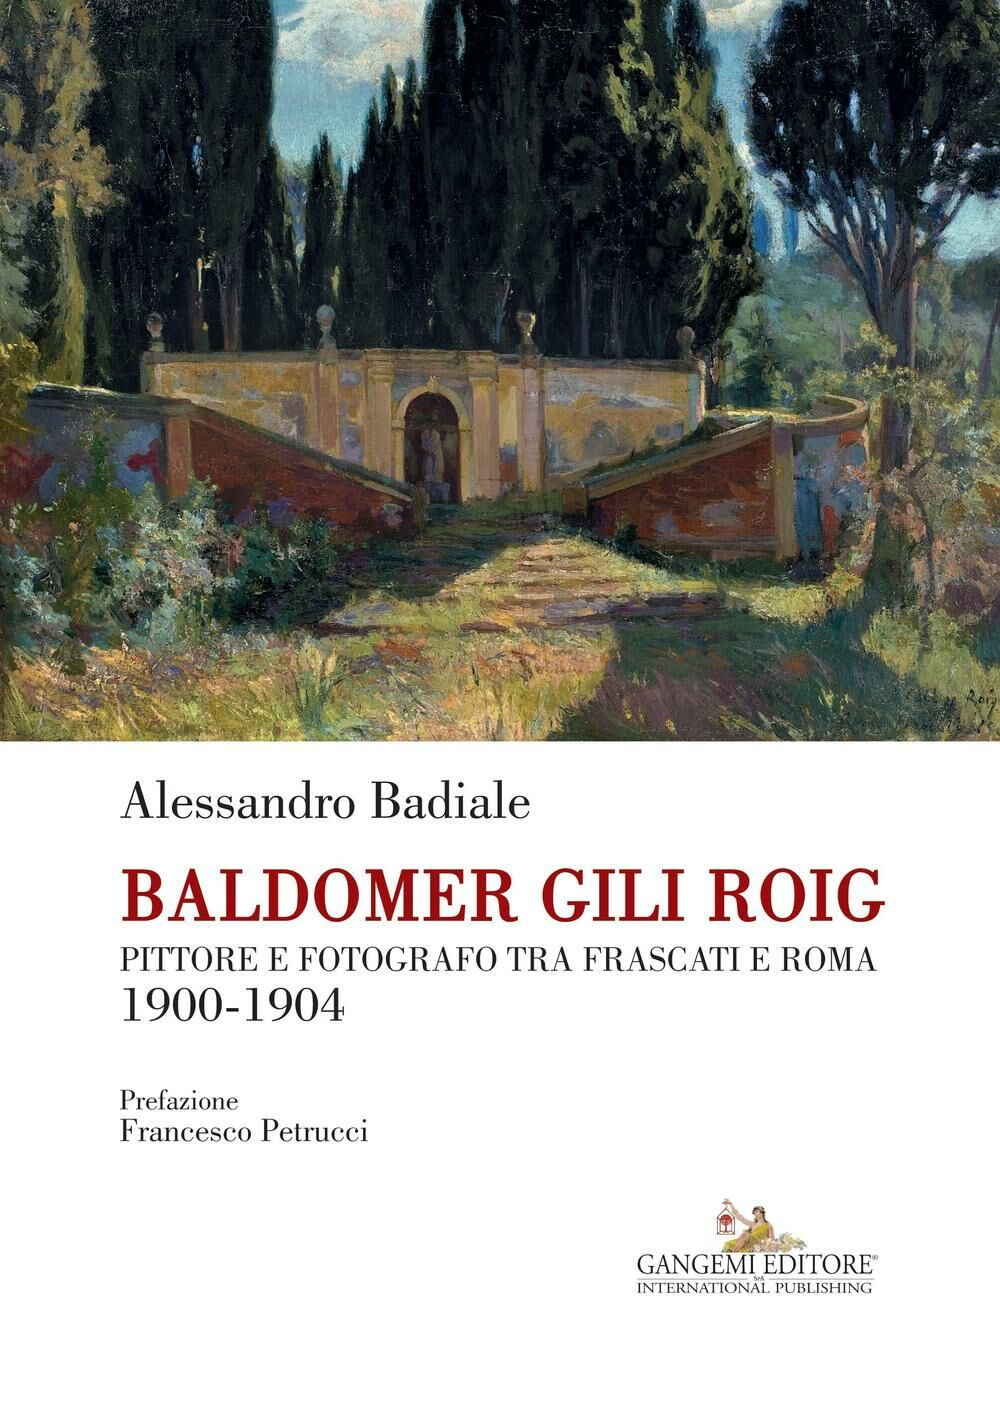 Baldomer Gili Roig. Pittore e fotografo tra Frascati e Roma 1900-1904